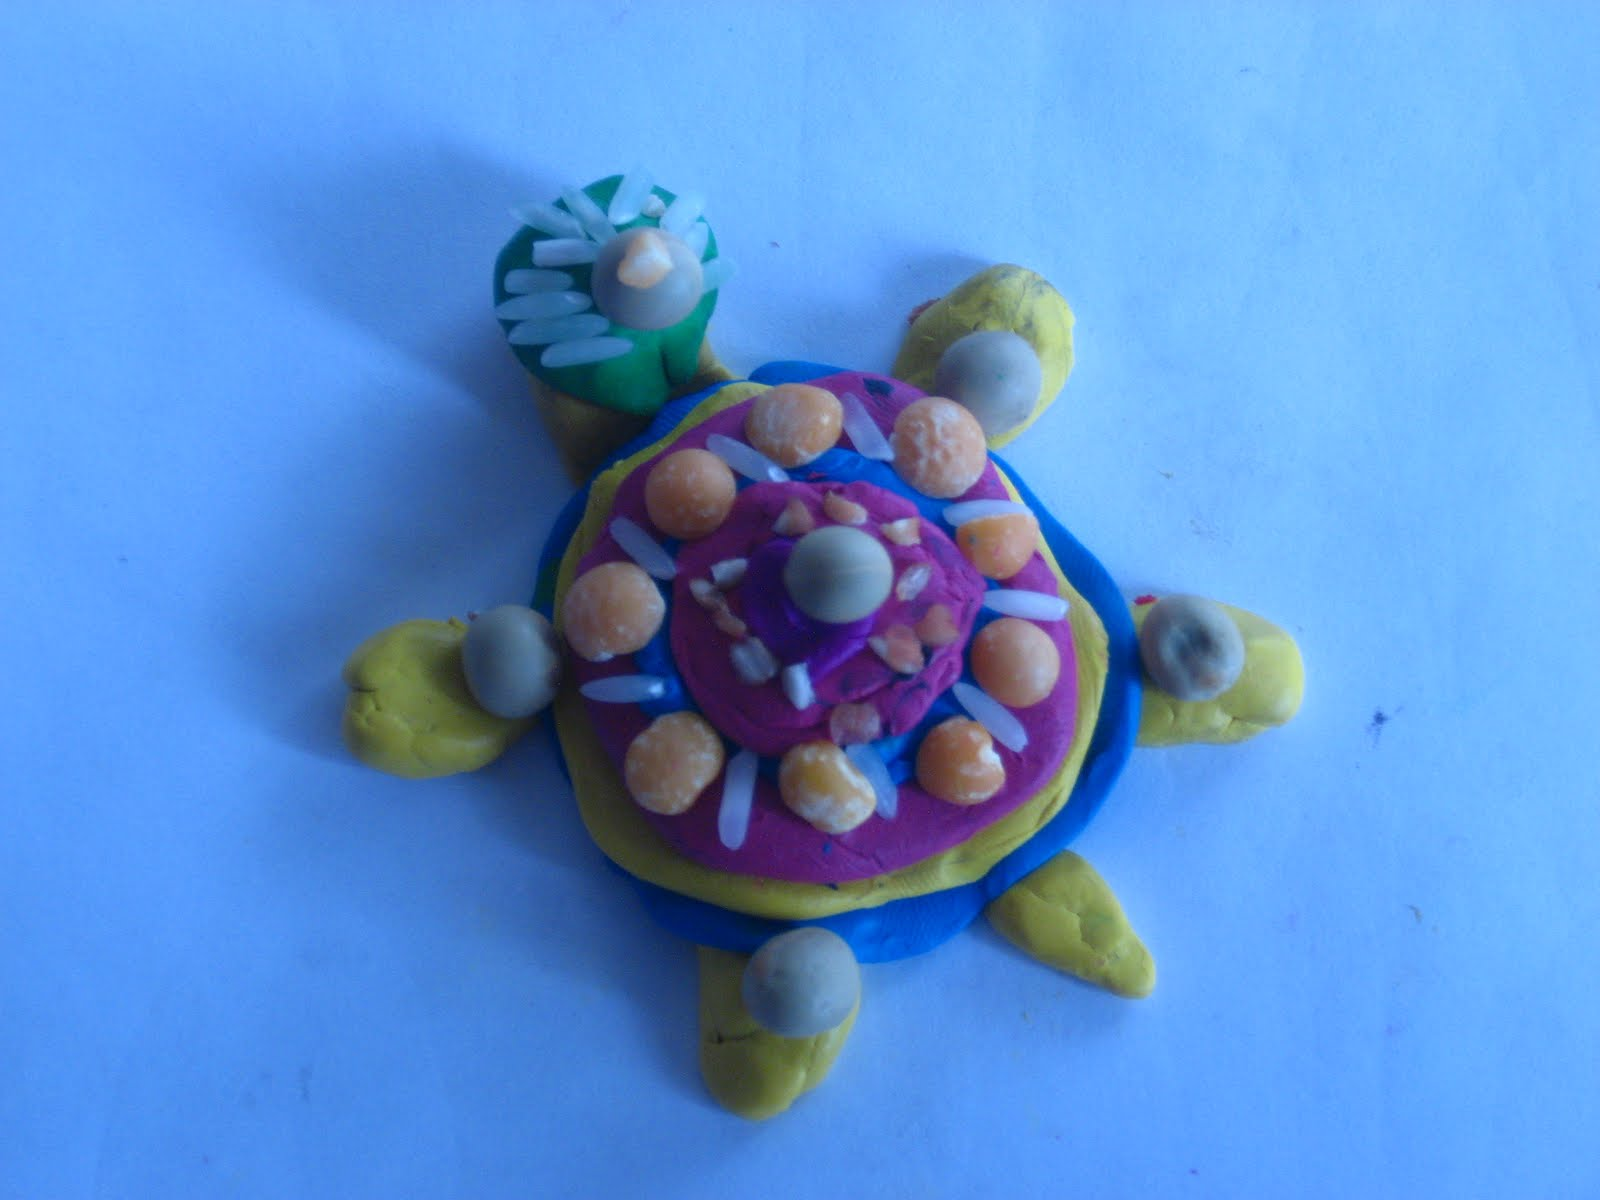 Черепаха из пластилина своими руками